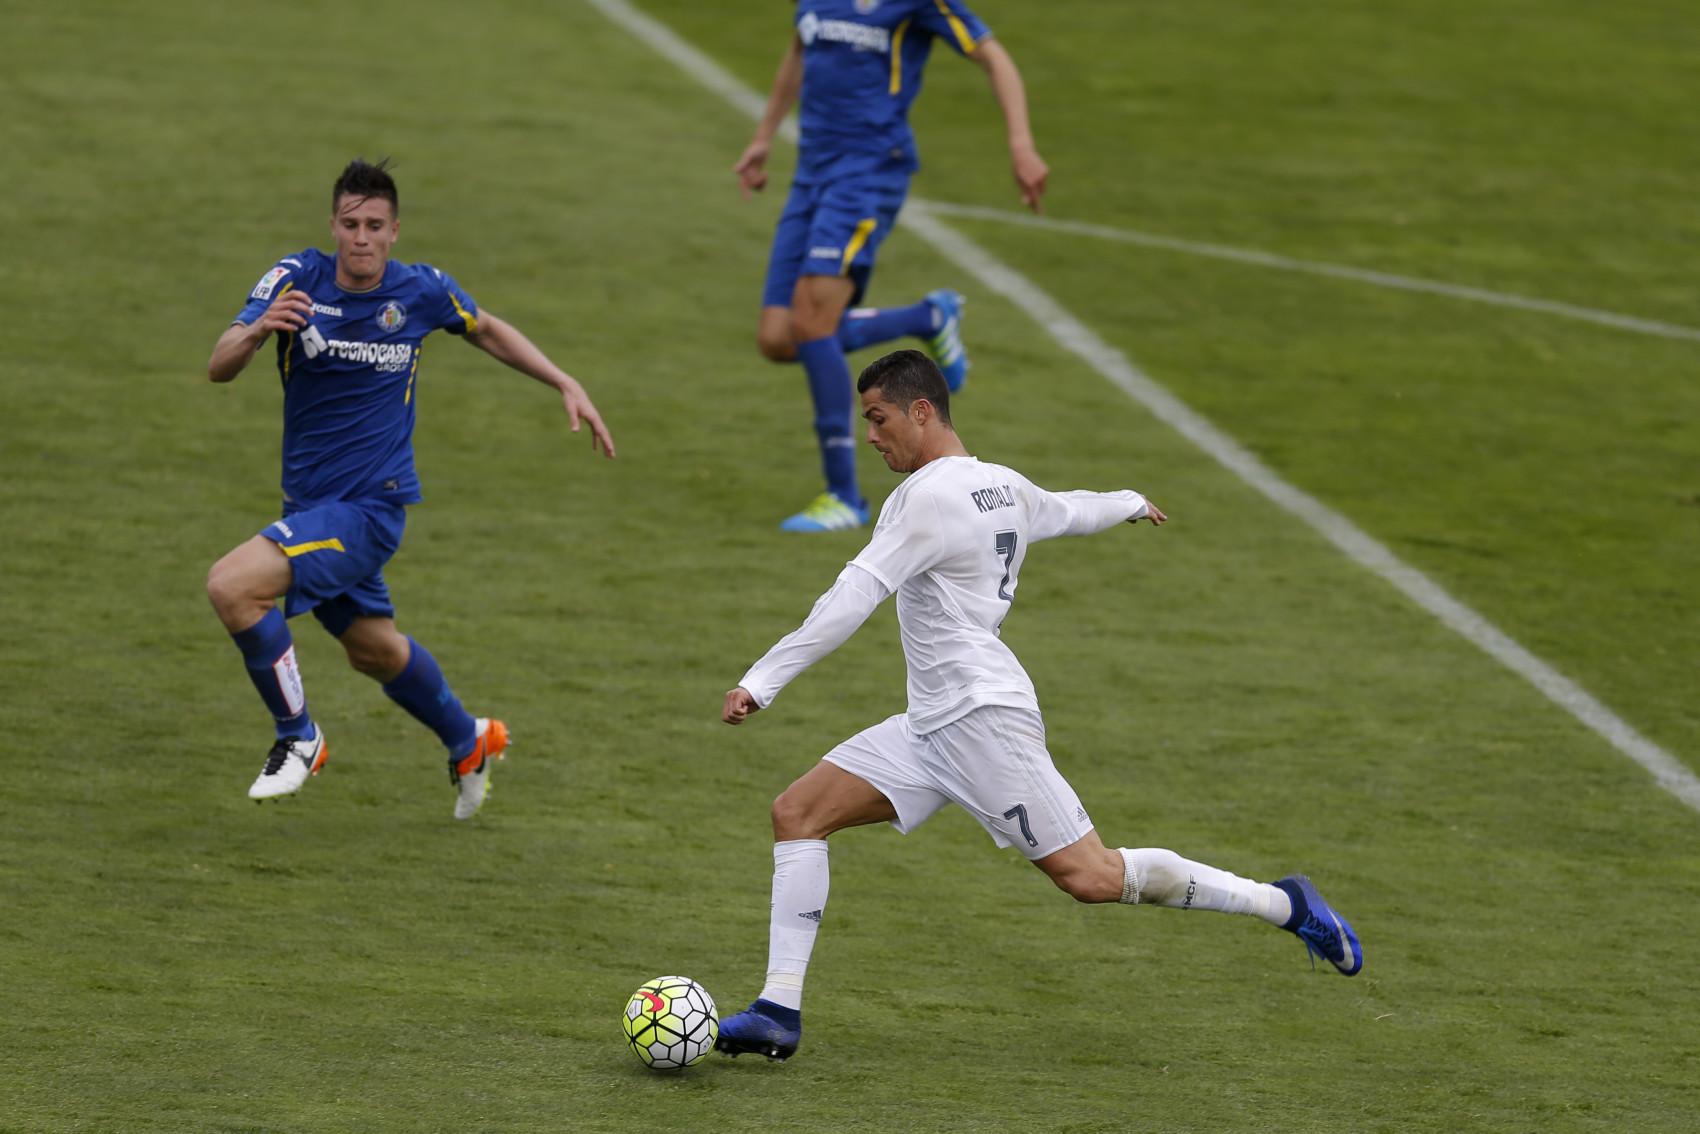 La Lige svitá na lepšie časy